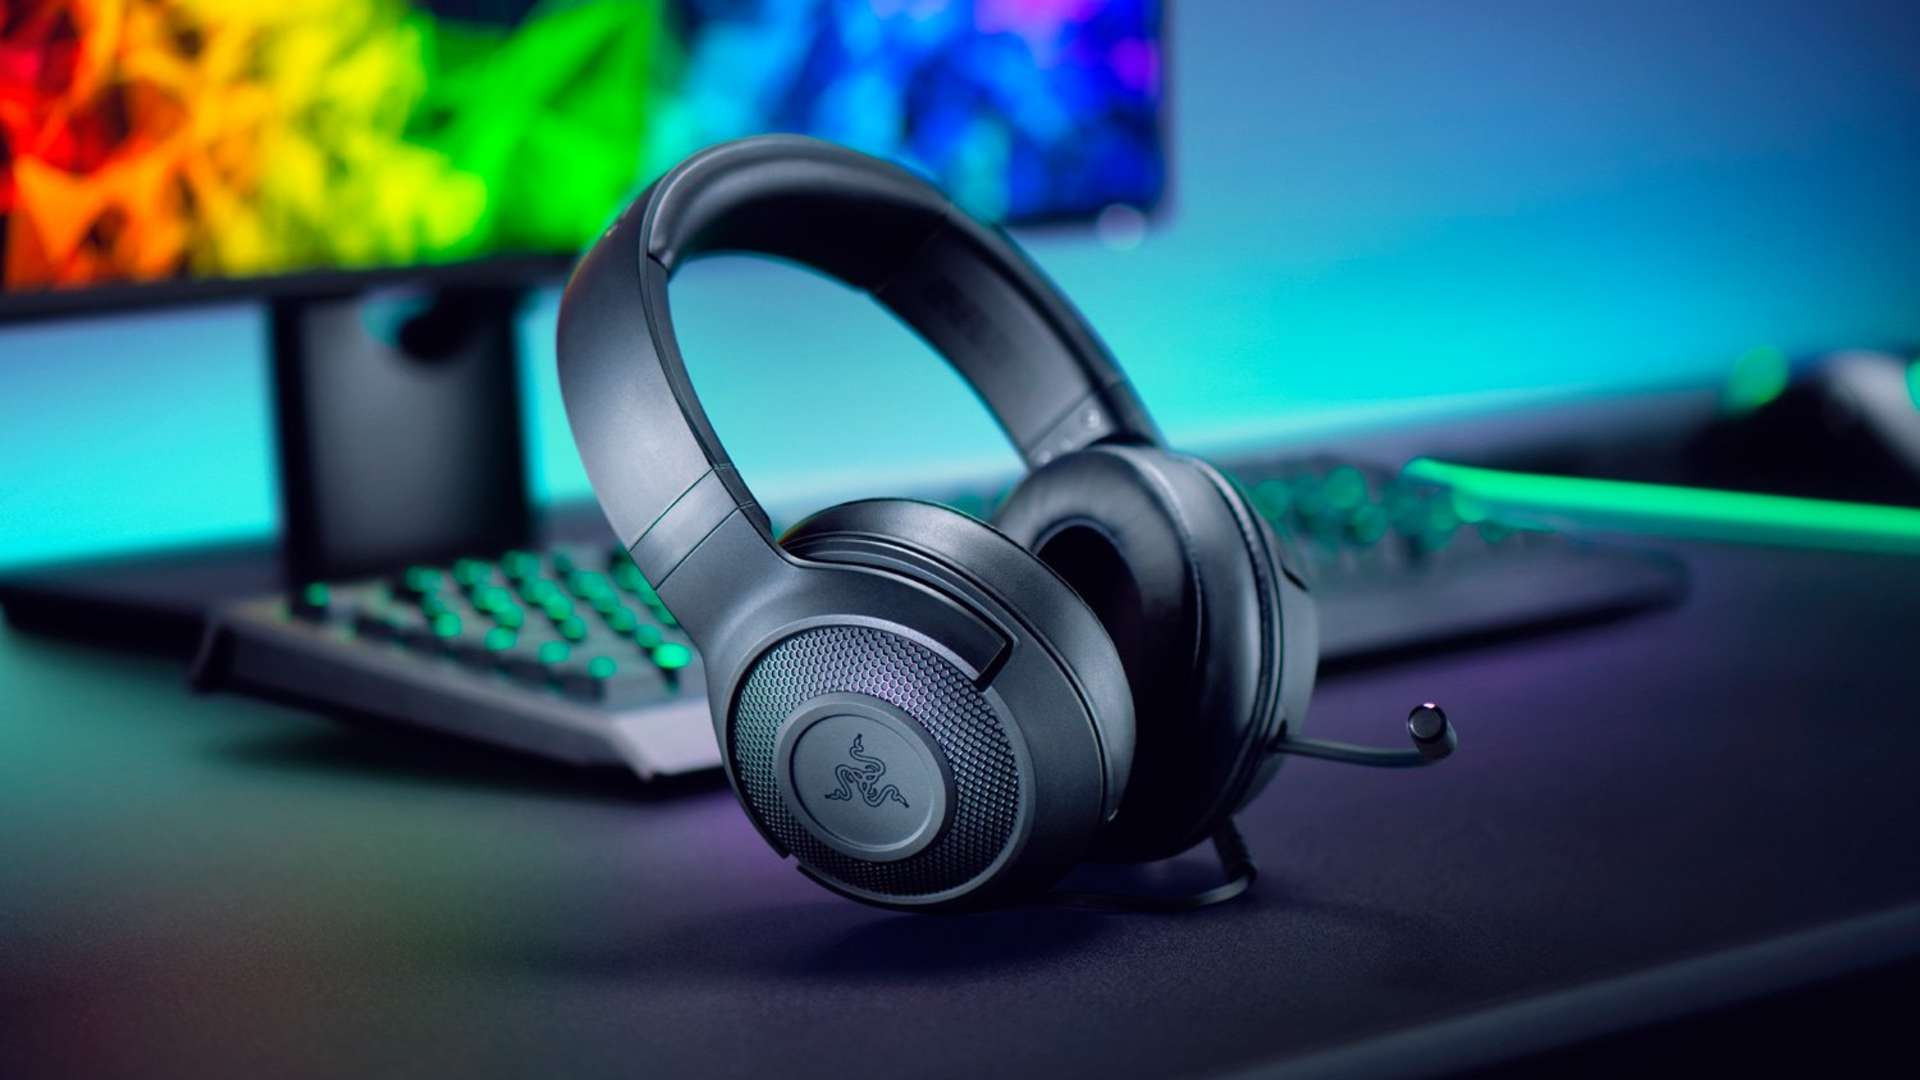 Razer's Kraken X headset is up to 28% cheaper today